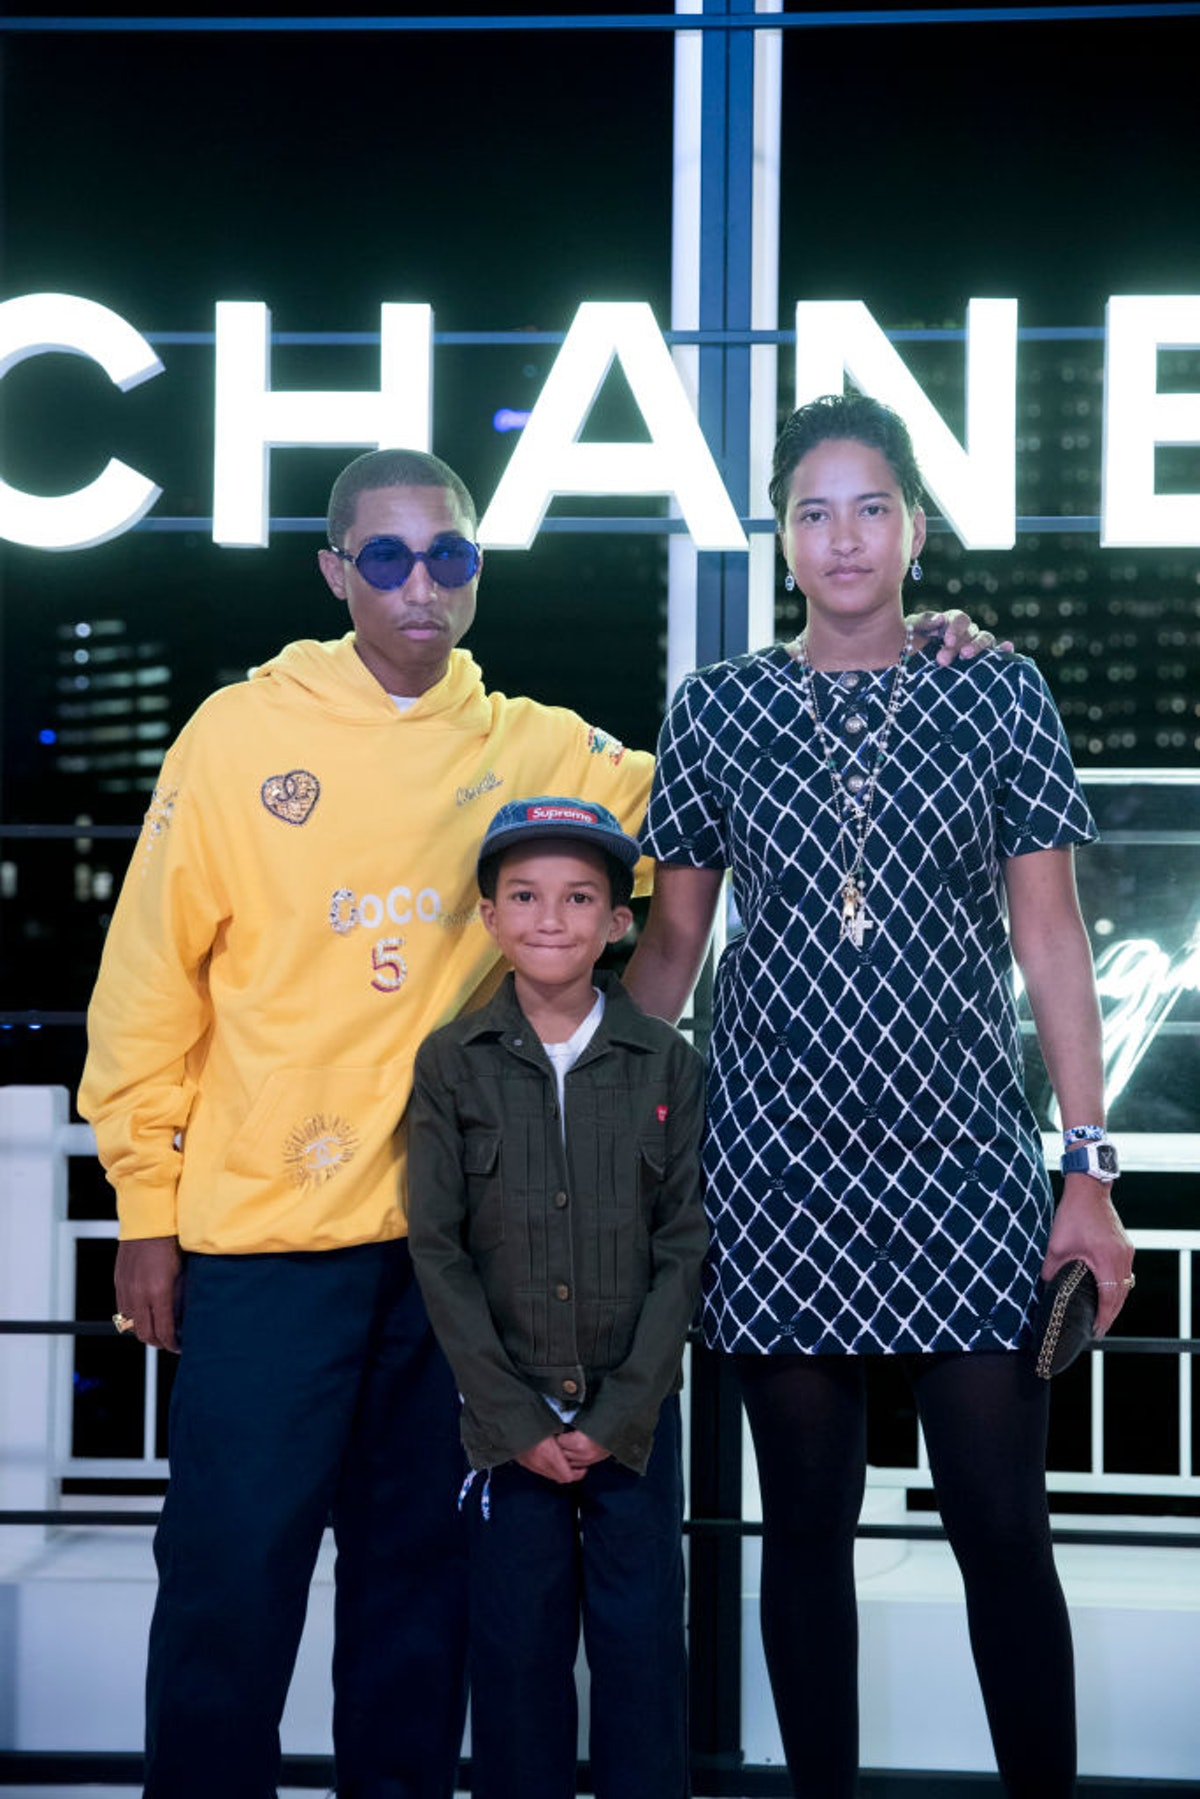 Chanel Cruise 2018/19 Replica Show In Bangkok - Sermsuk Warehouse Pepsi Pier